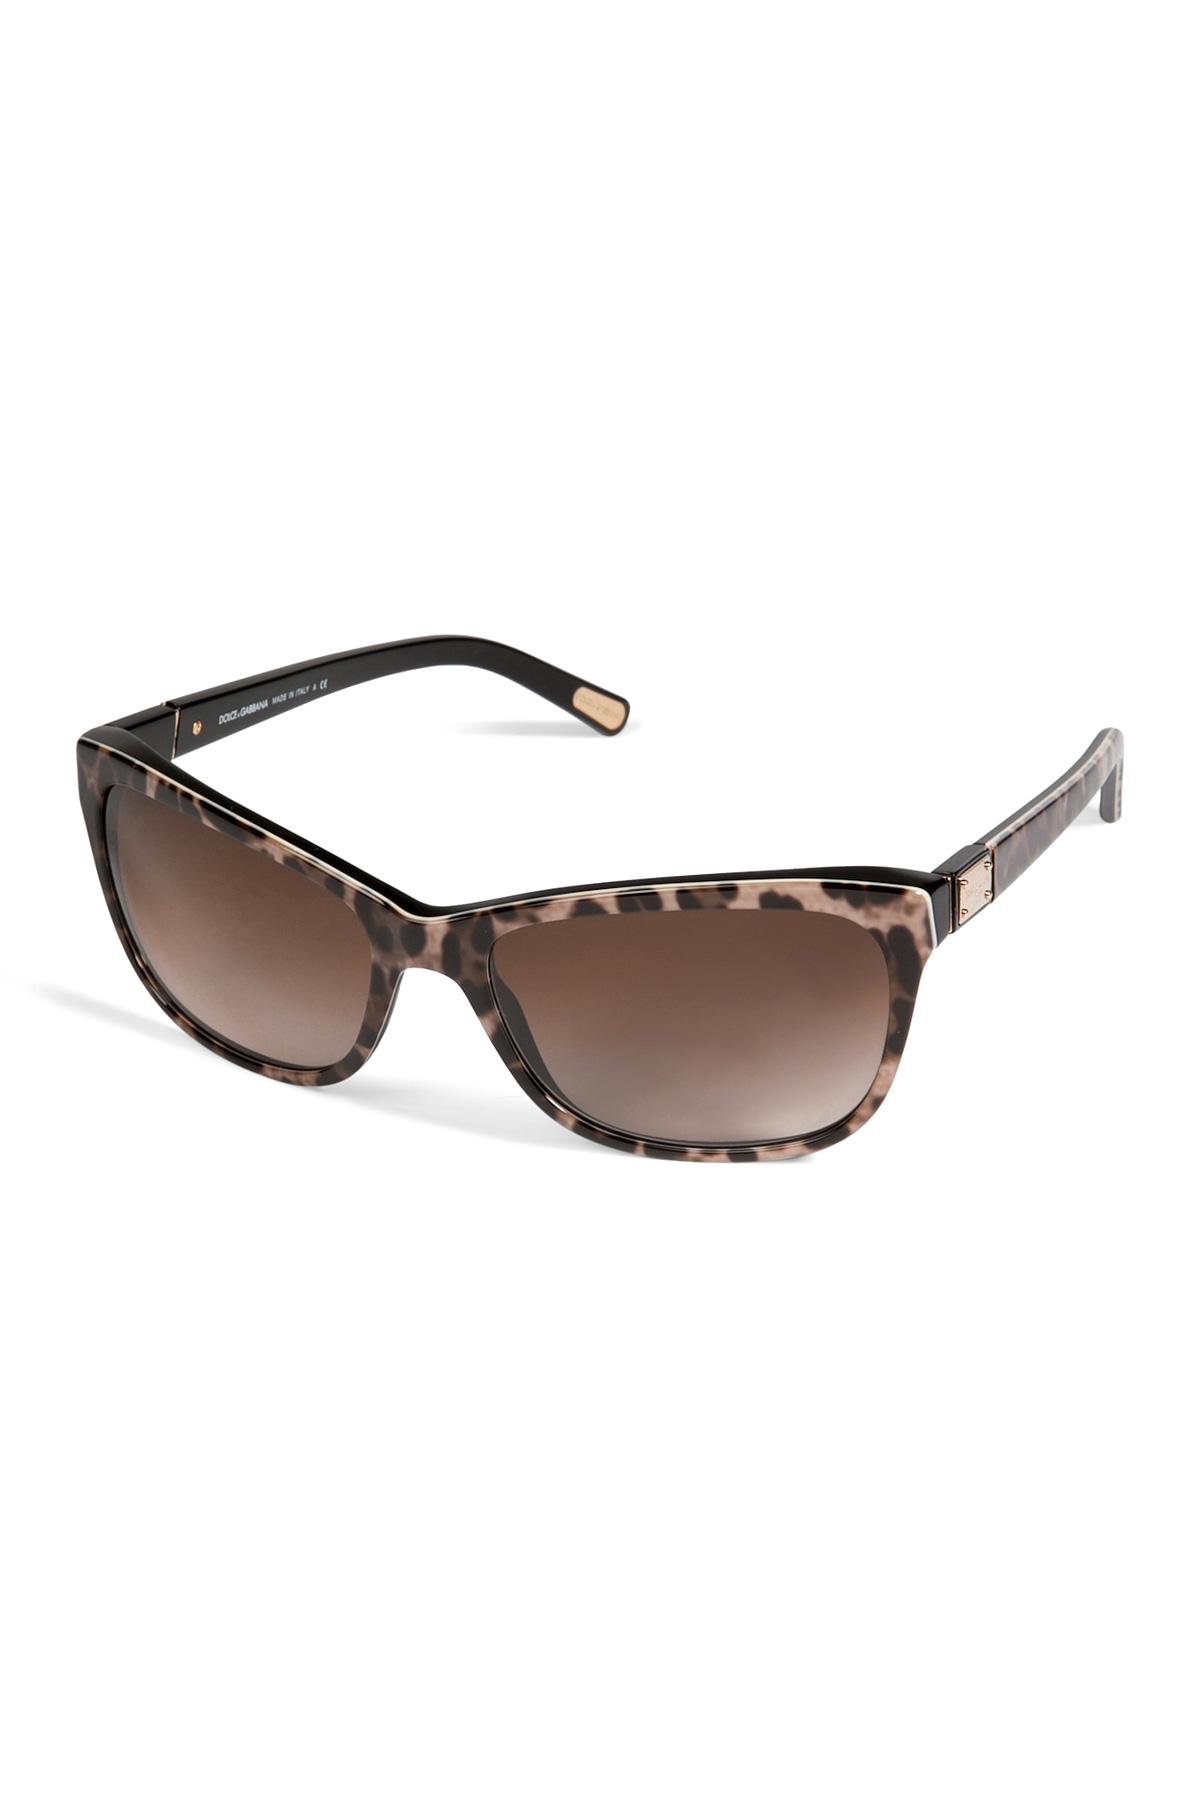 e23214fc30476 Lyst - Dolce   Gabbana Acetate Animal Print Gradient Sunglasses in ...